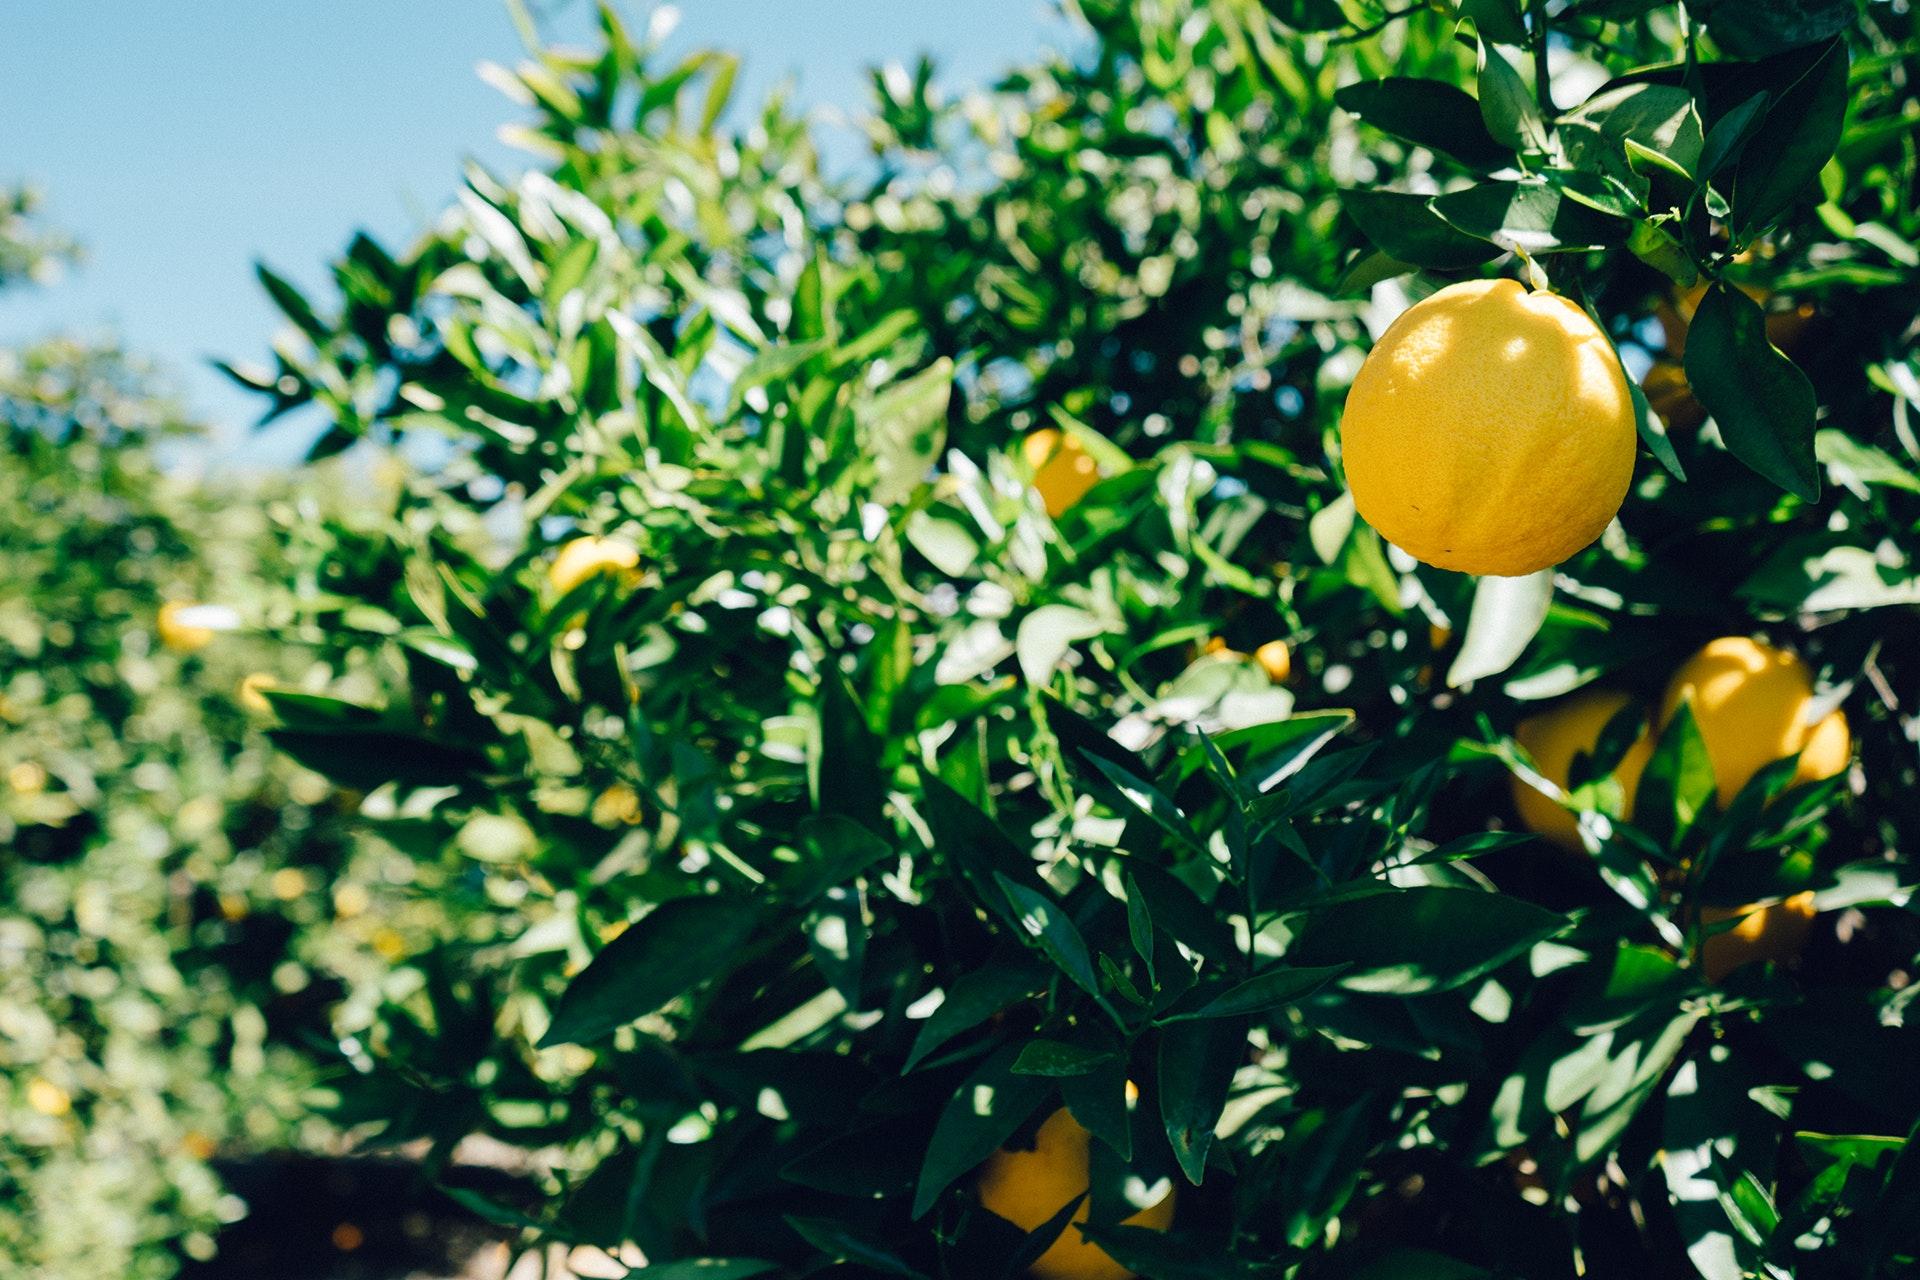 Myer lemon tree with ripe fruit